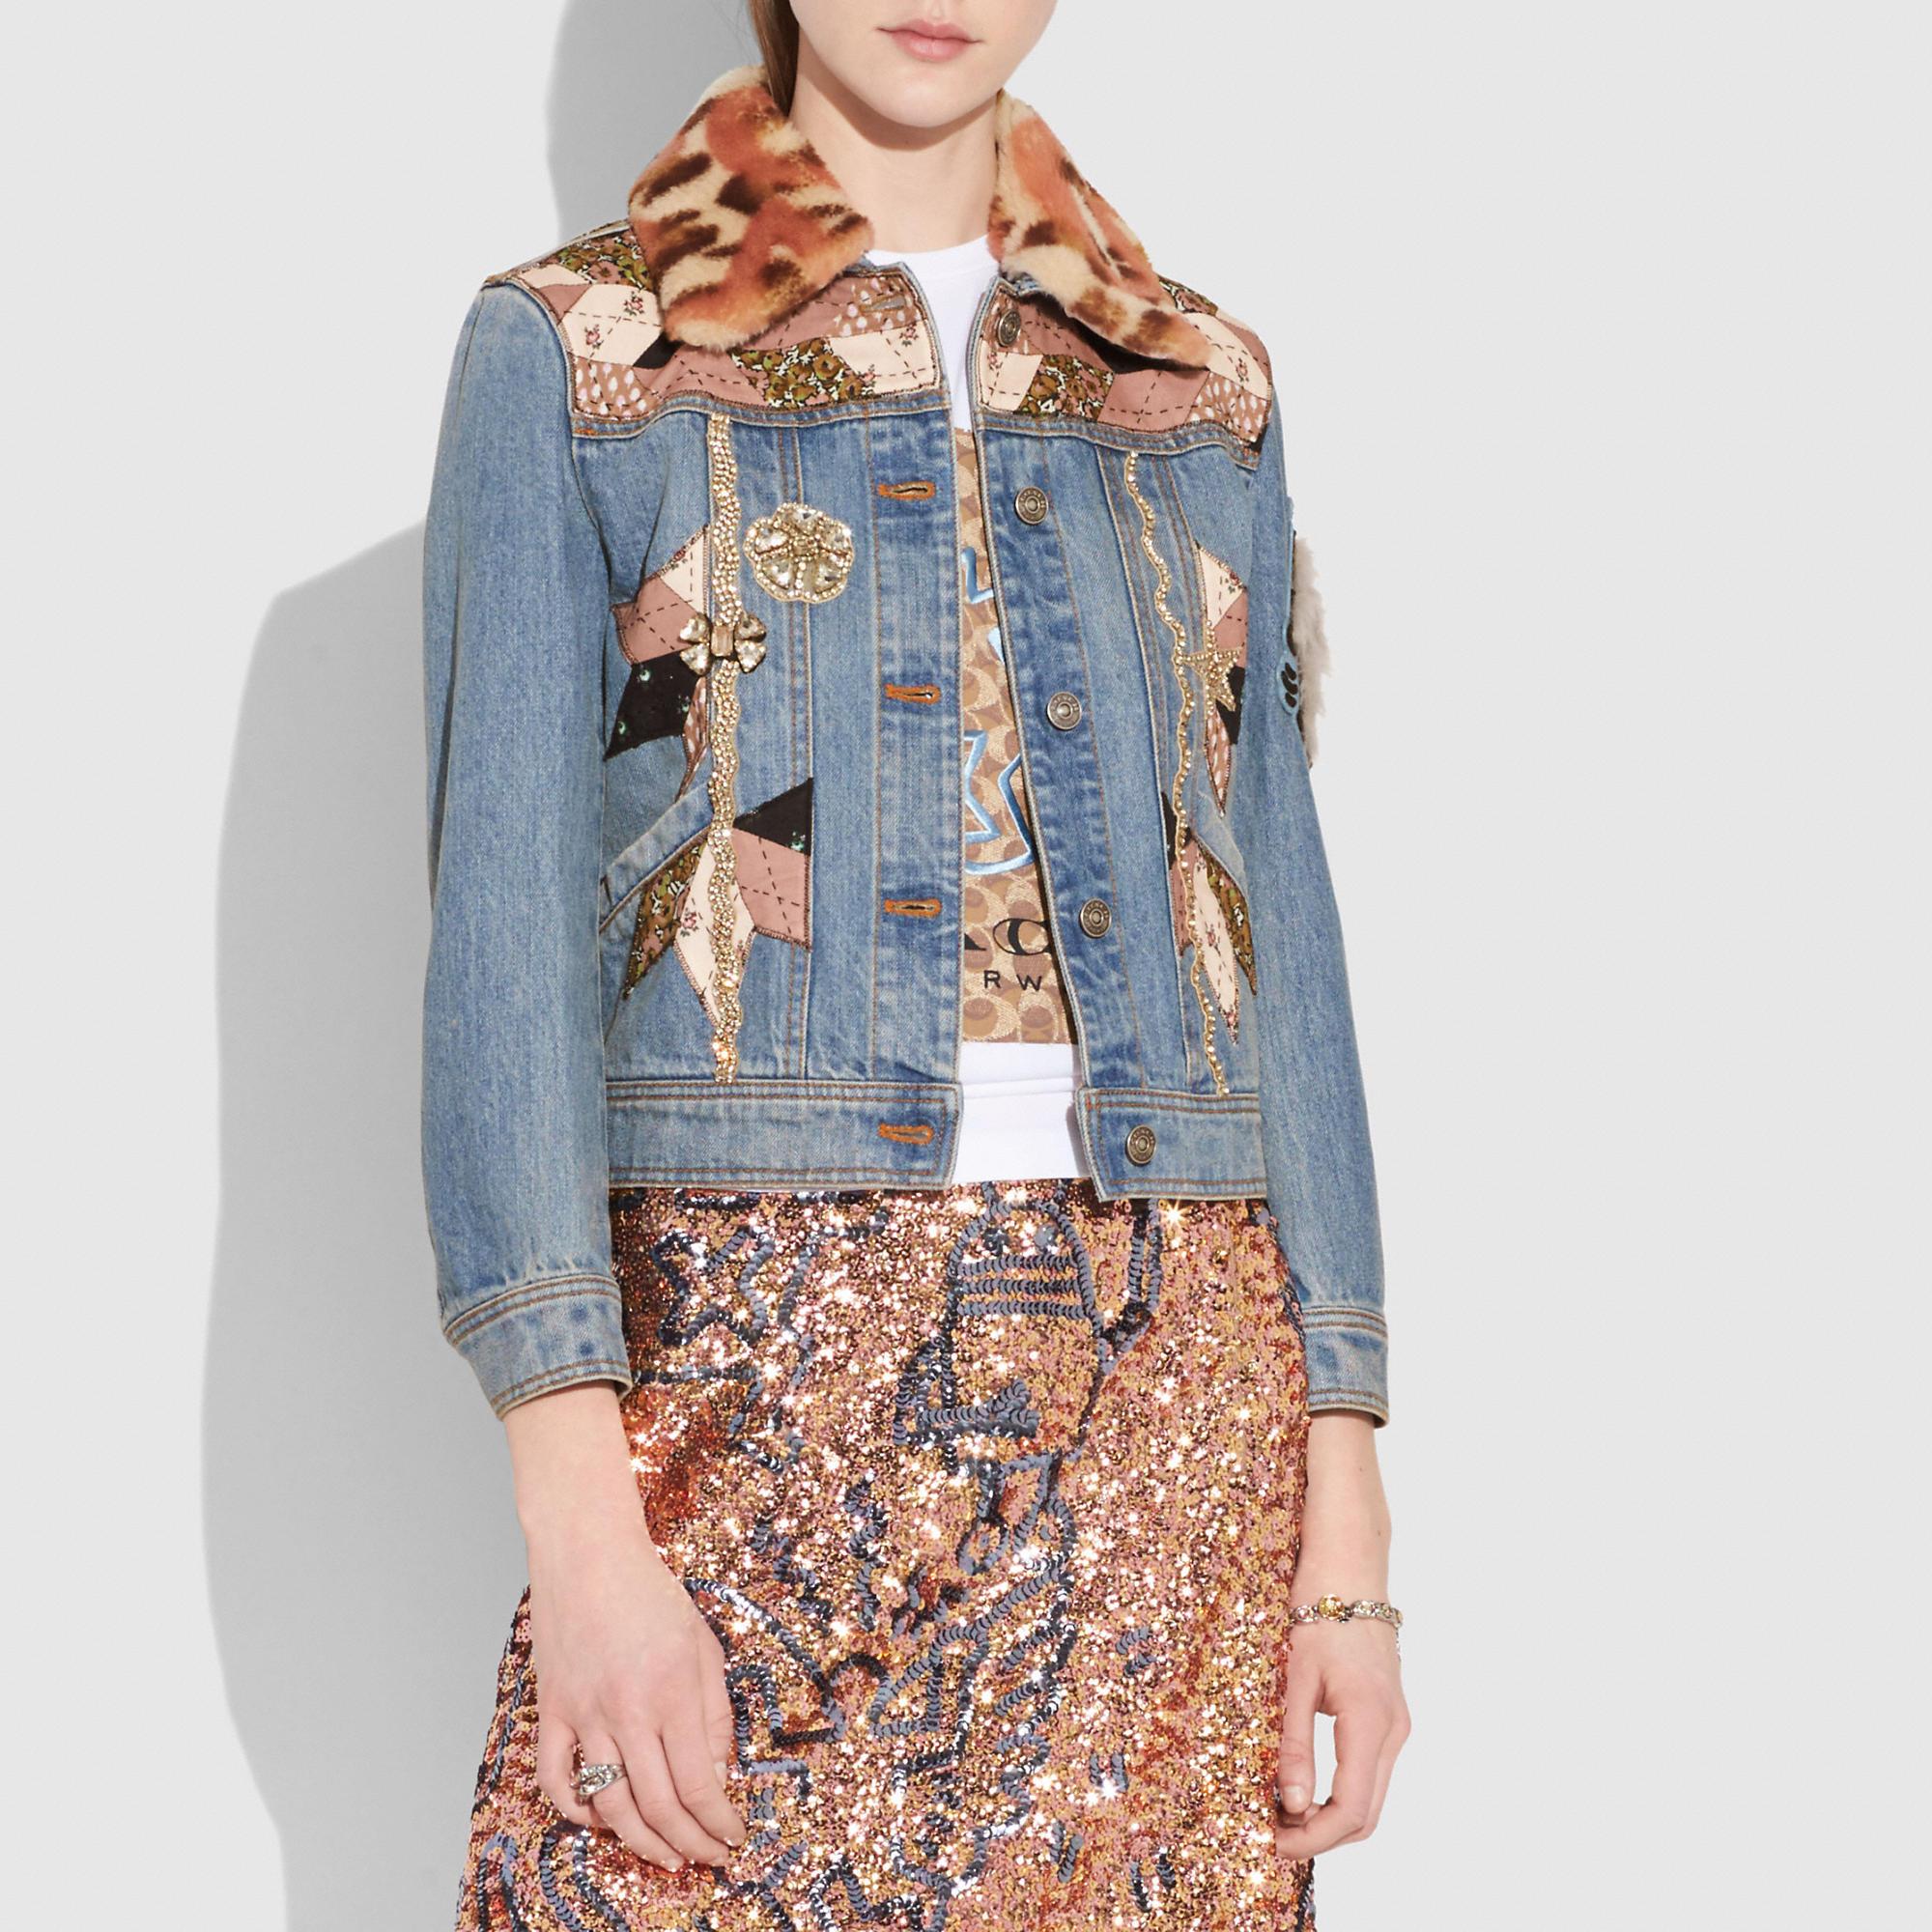 Coach Embellished Quilted Patchwork Denim Jacket In Blue Modesens Denim Jacket Embellished Denim Jacket Clothes Design [ 2000 x 2000 Pixel ]